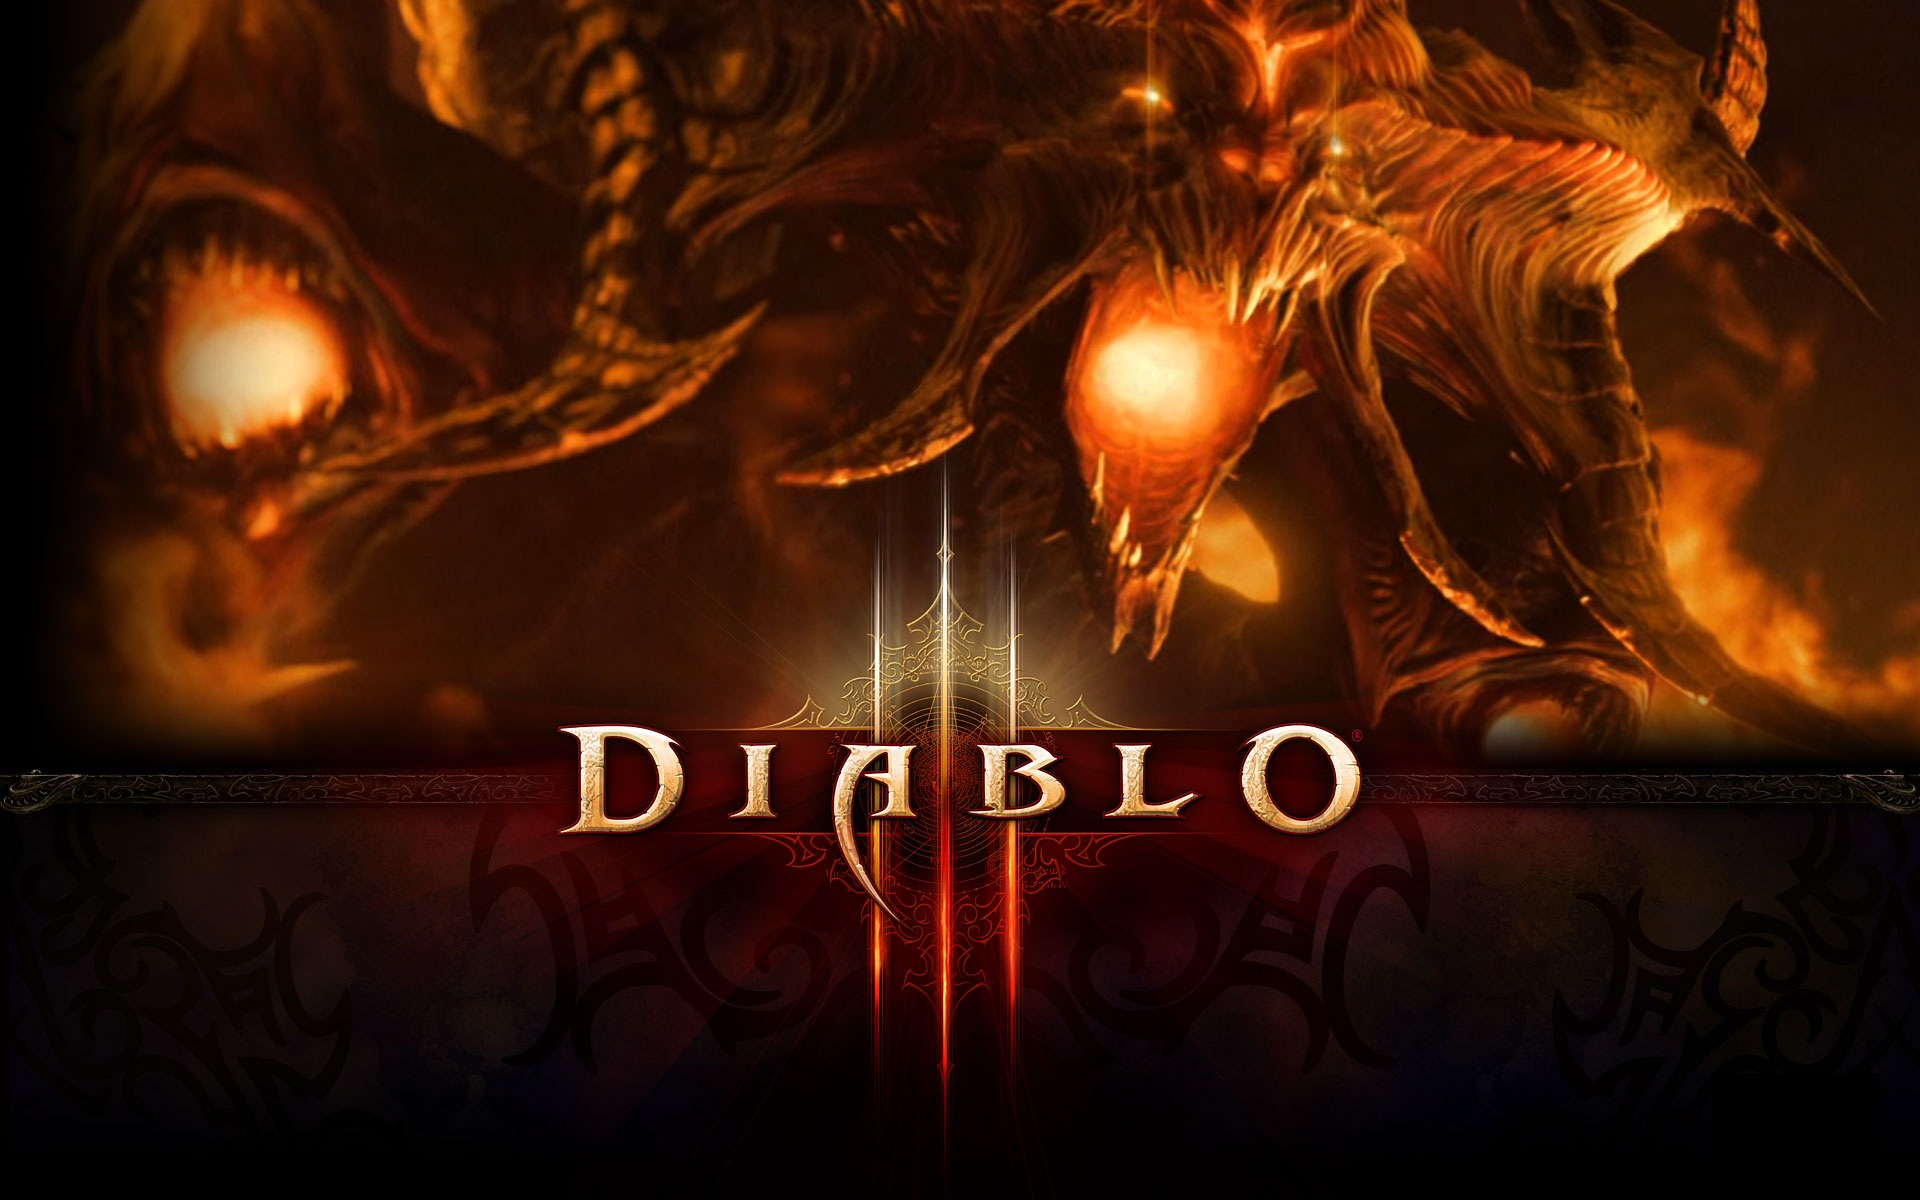 diablo 3 featured image